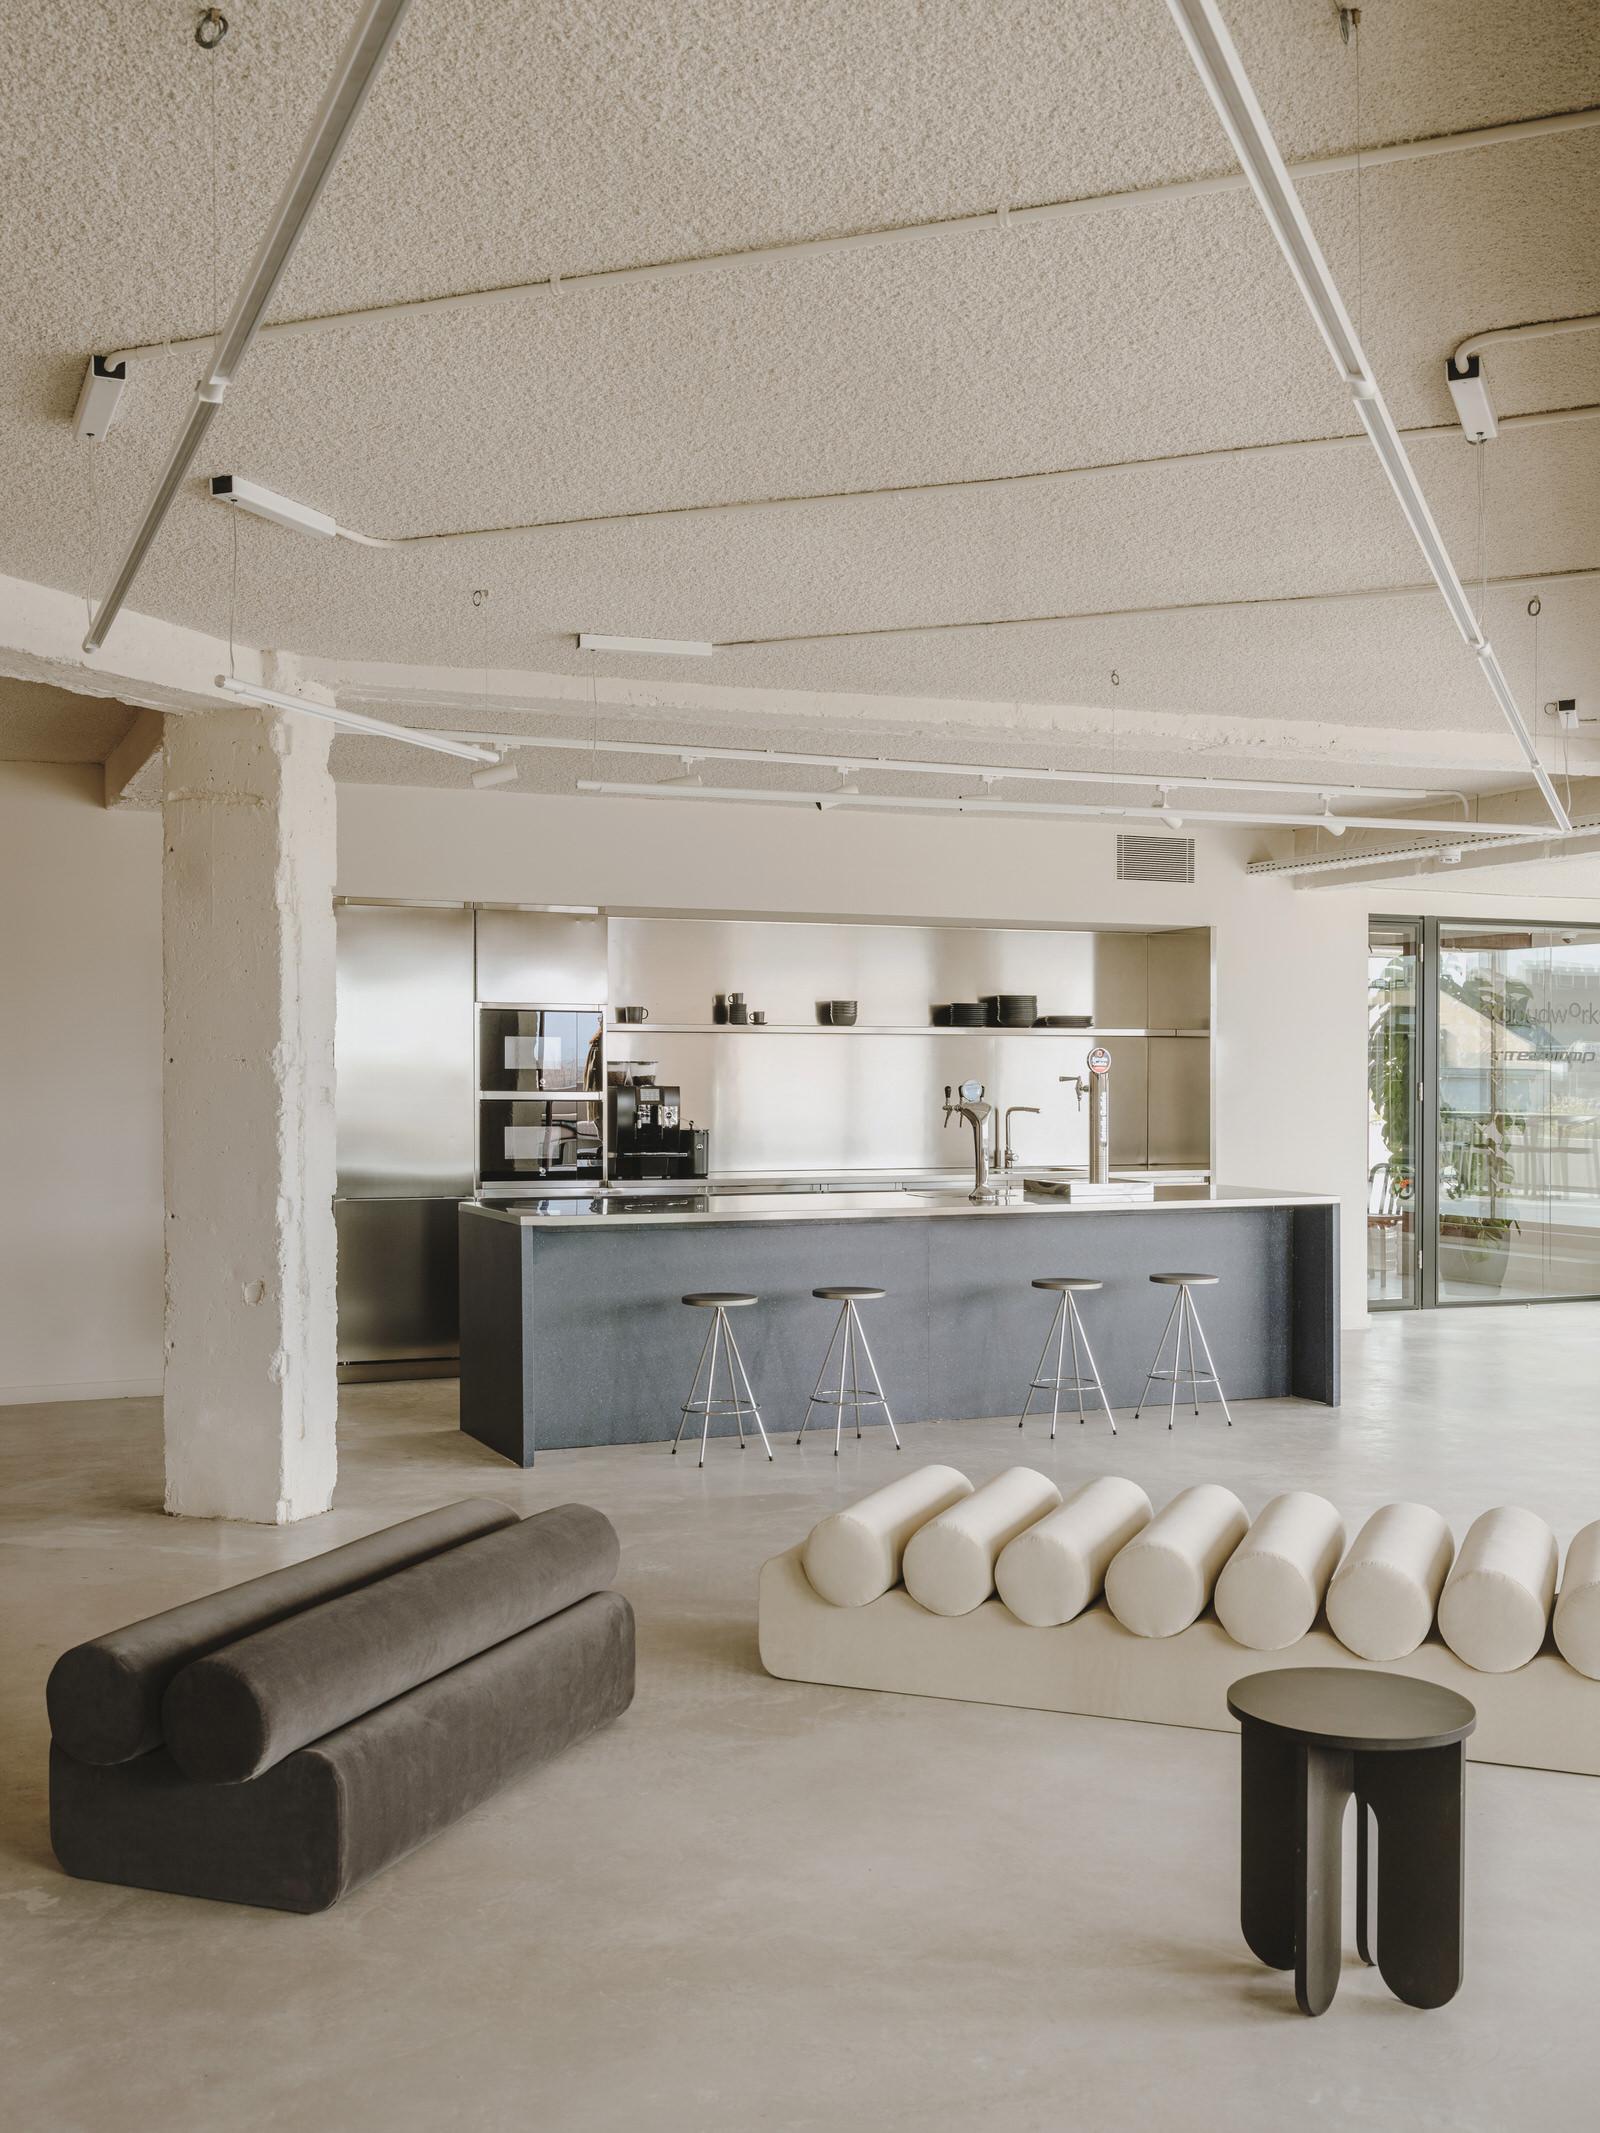 Mesura Architecture Design Cloudworks Penthouse Office Barcelona Photo Salva Lopez Yellowtrace 09